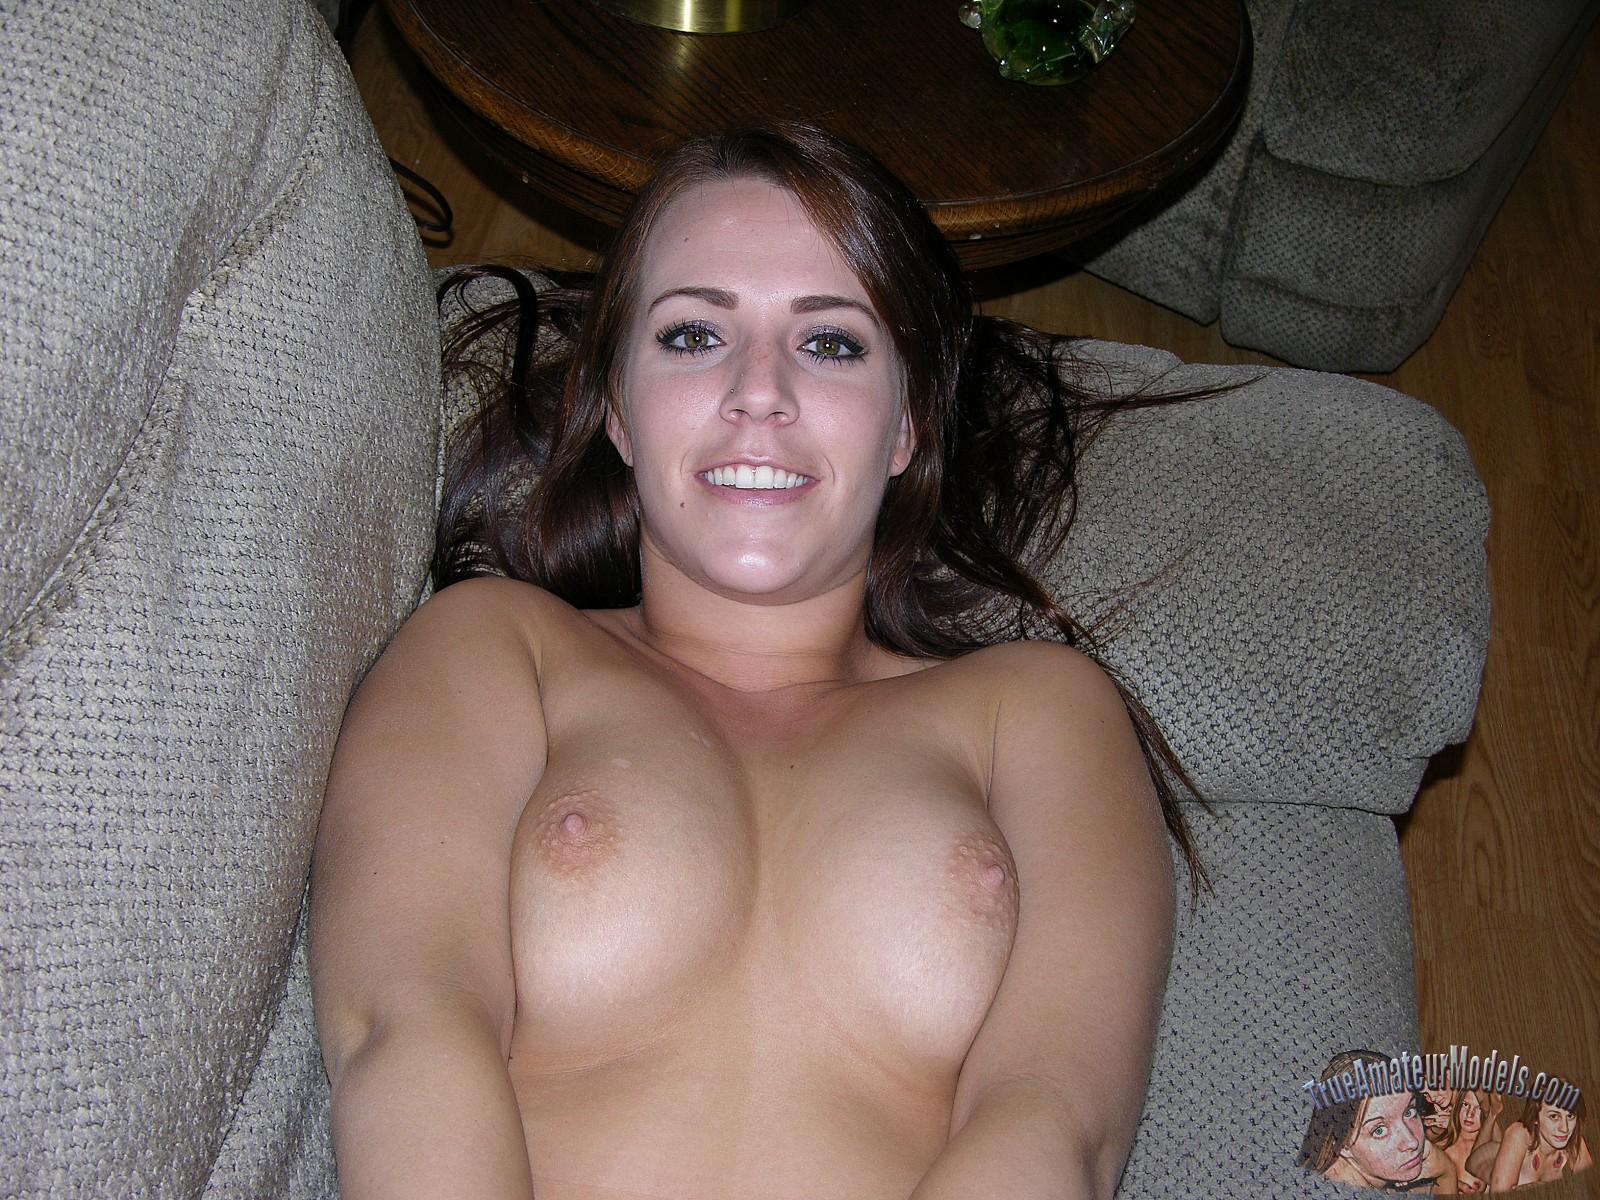 ameture-pussy-model-tanned-blonde-slut